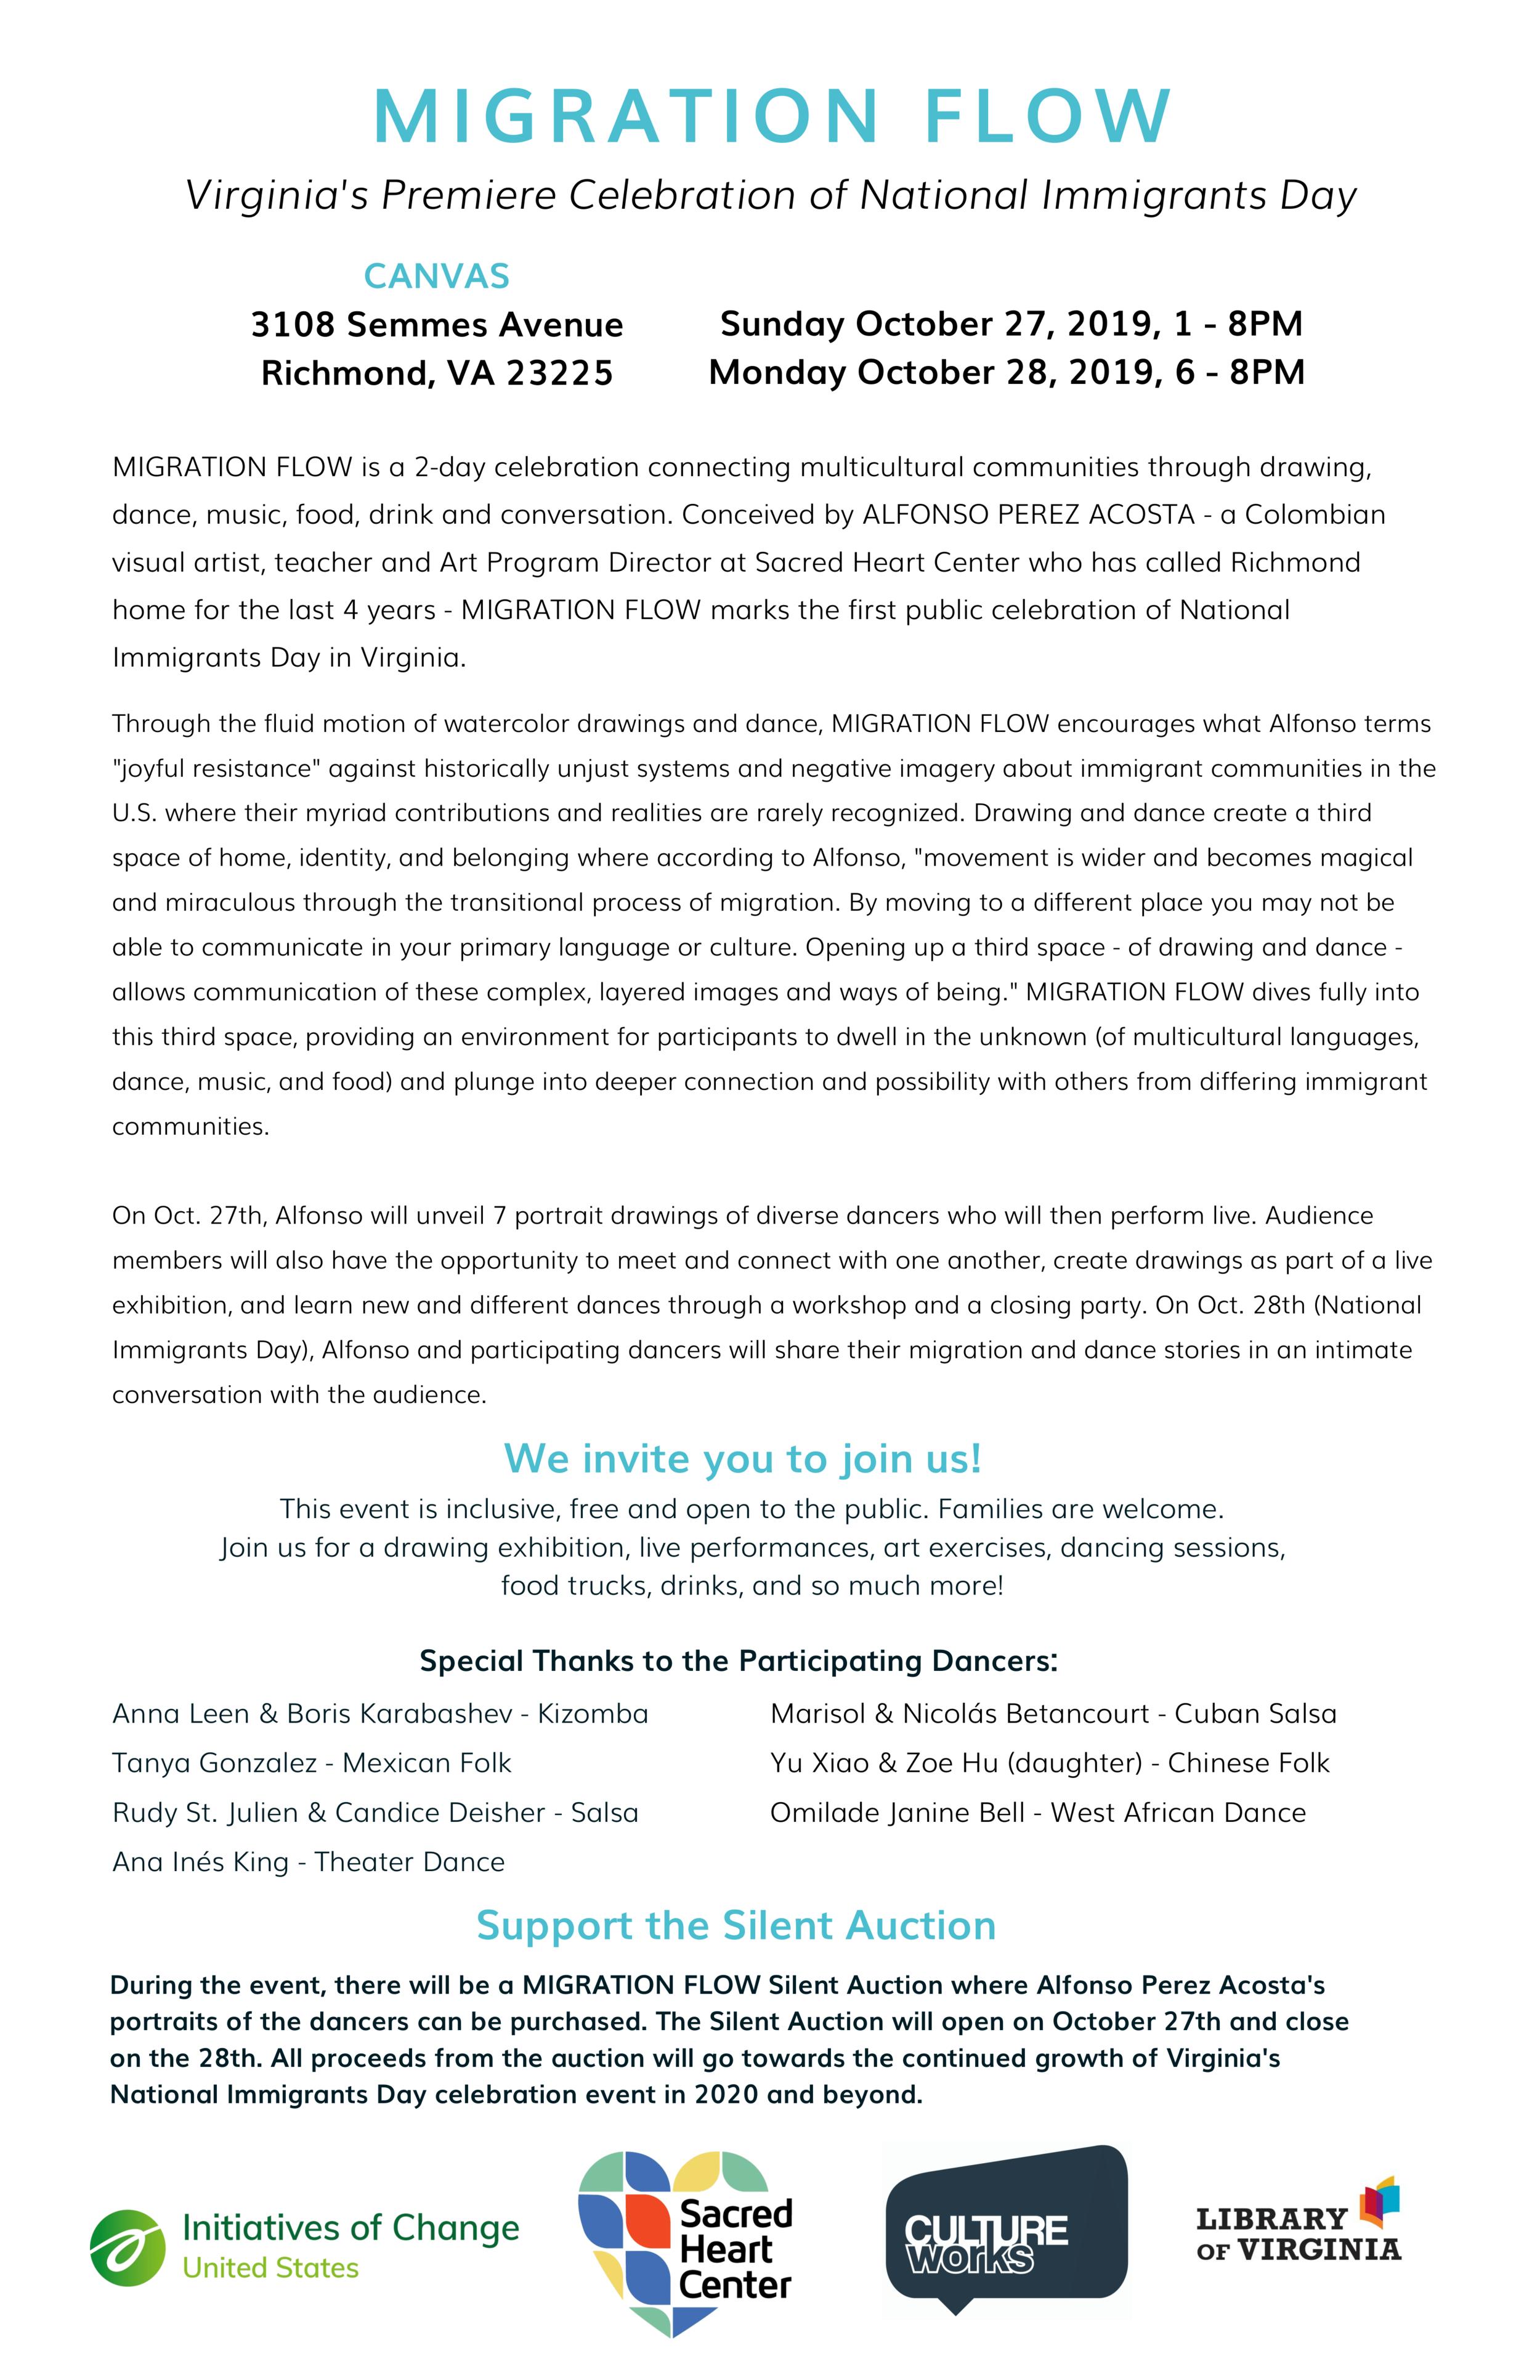 MIGRATION FLOW Oct 27-28 press release.png